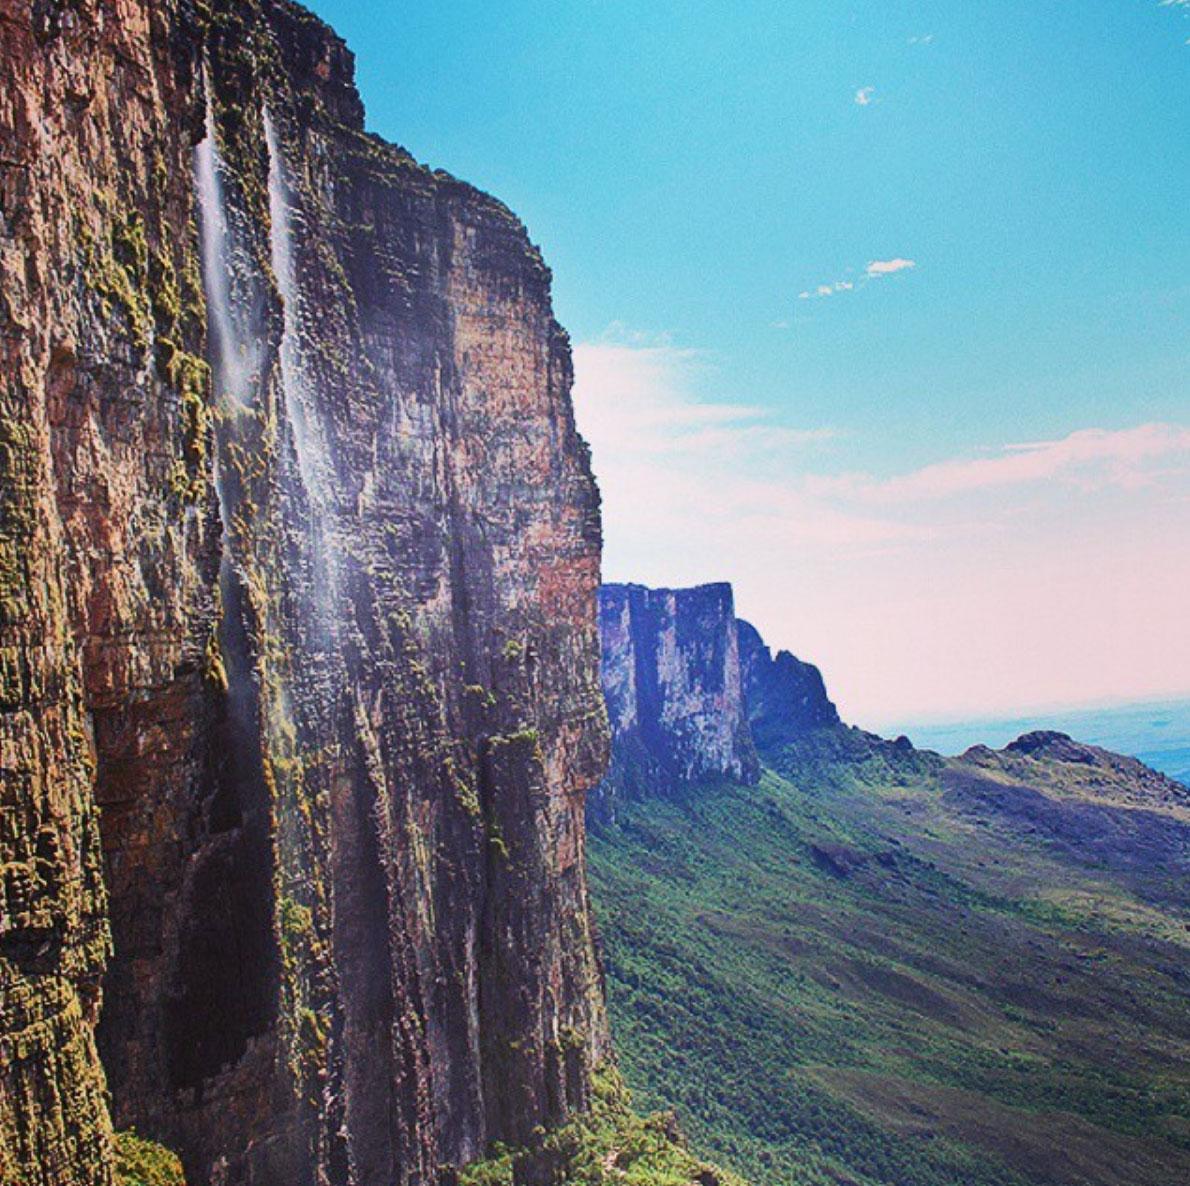 Waterfall at the Roraima, Canaima, Venezuela